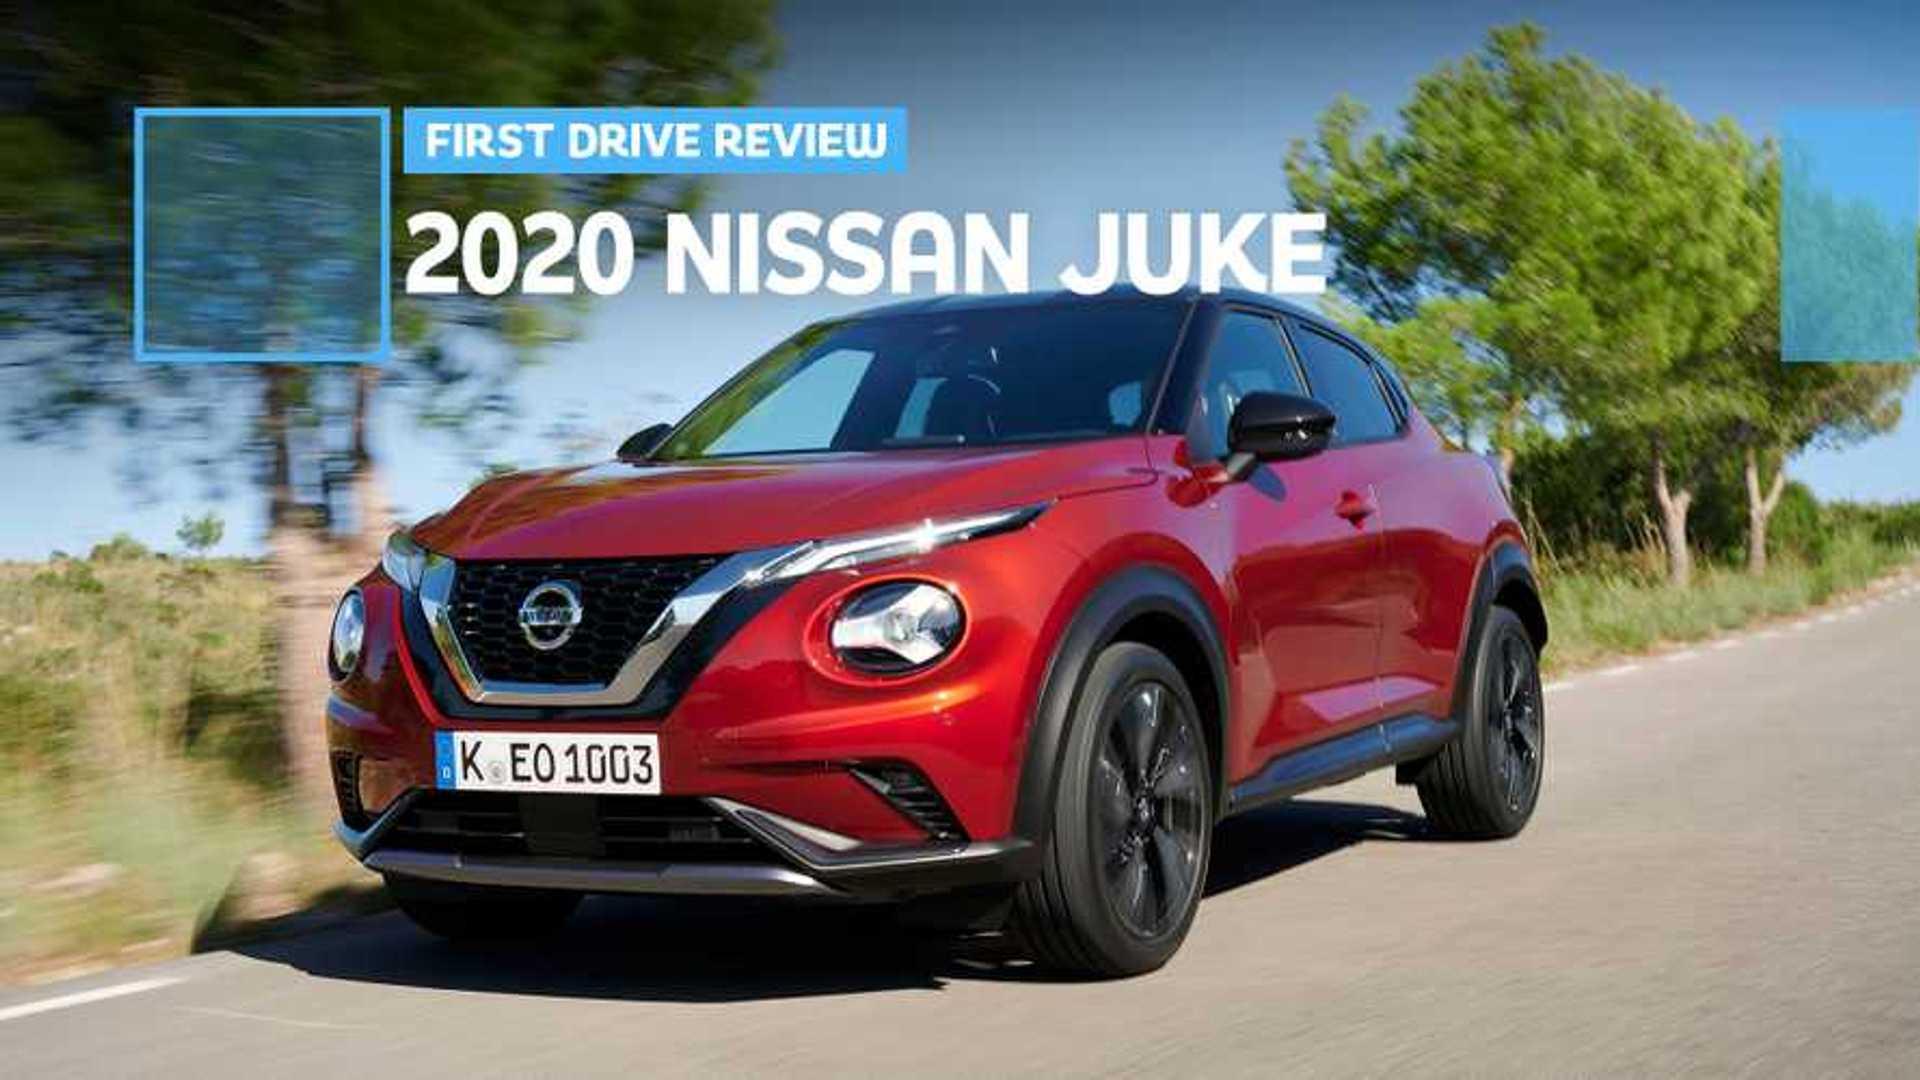 2020 Nissan Juke First Drive: Popular Provacateur - Flipboard